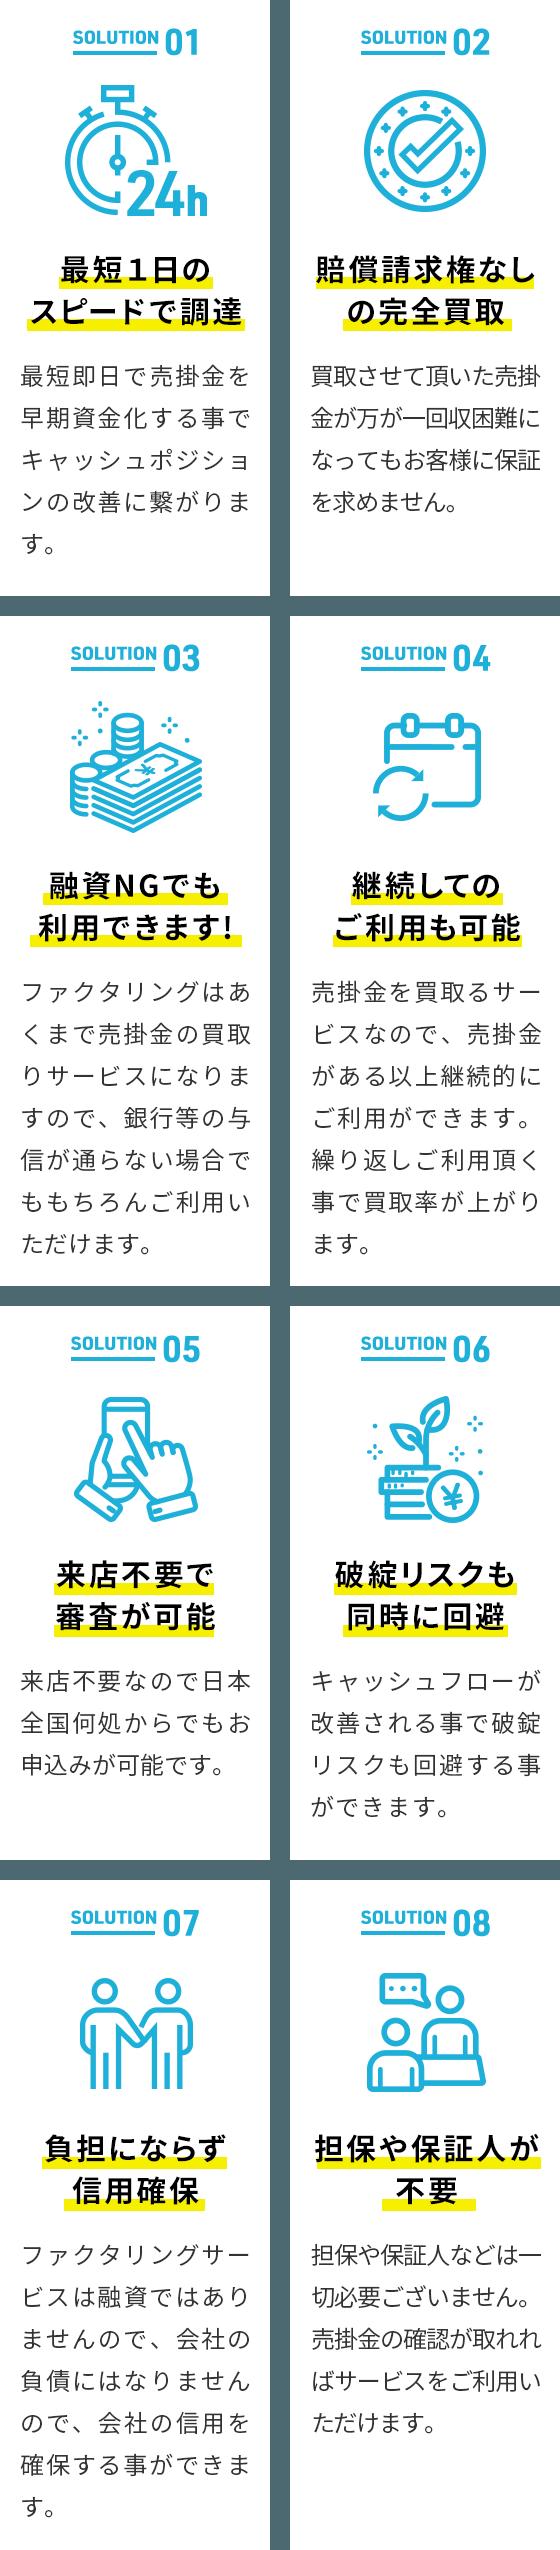 SOLUTION:解決方法